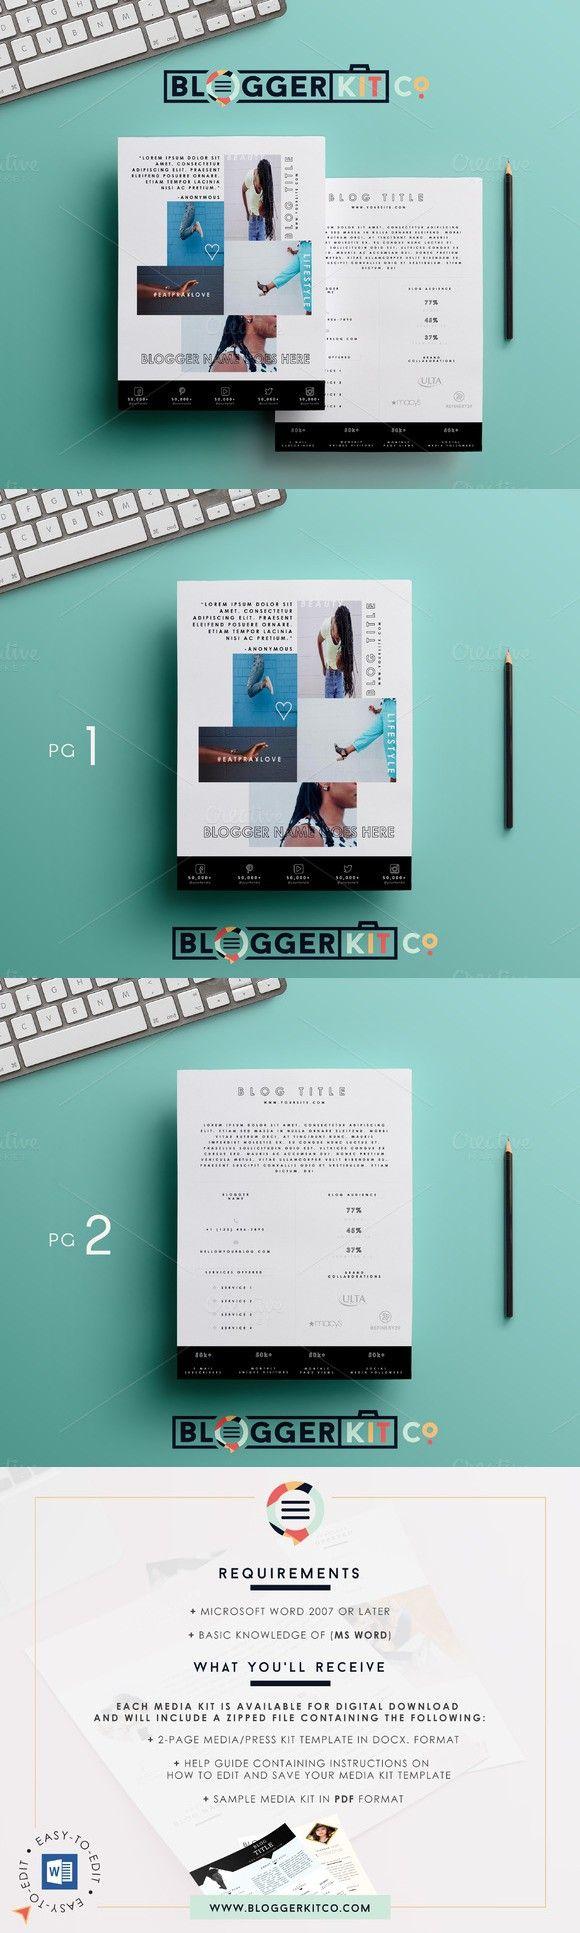 2PG Media Kit A Vibrant Thing